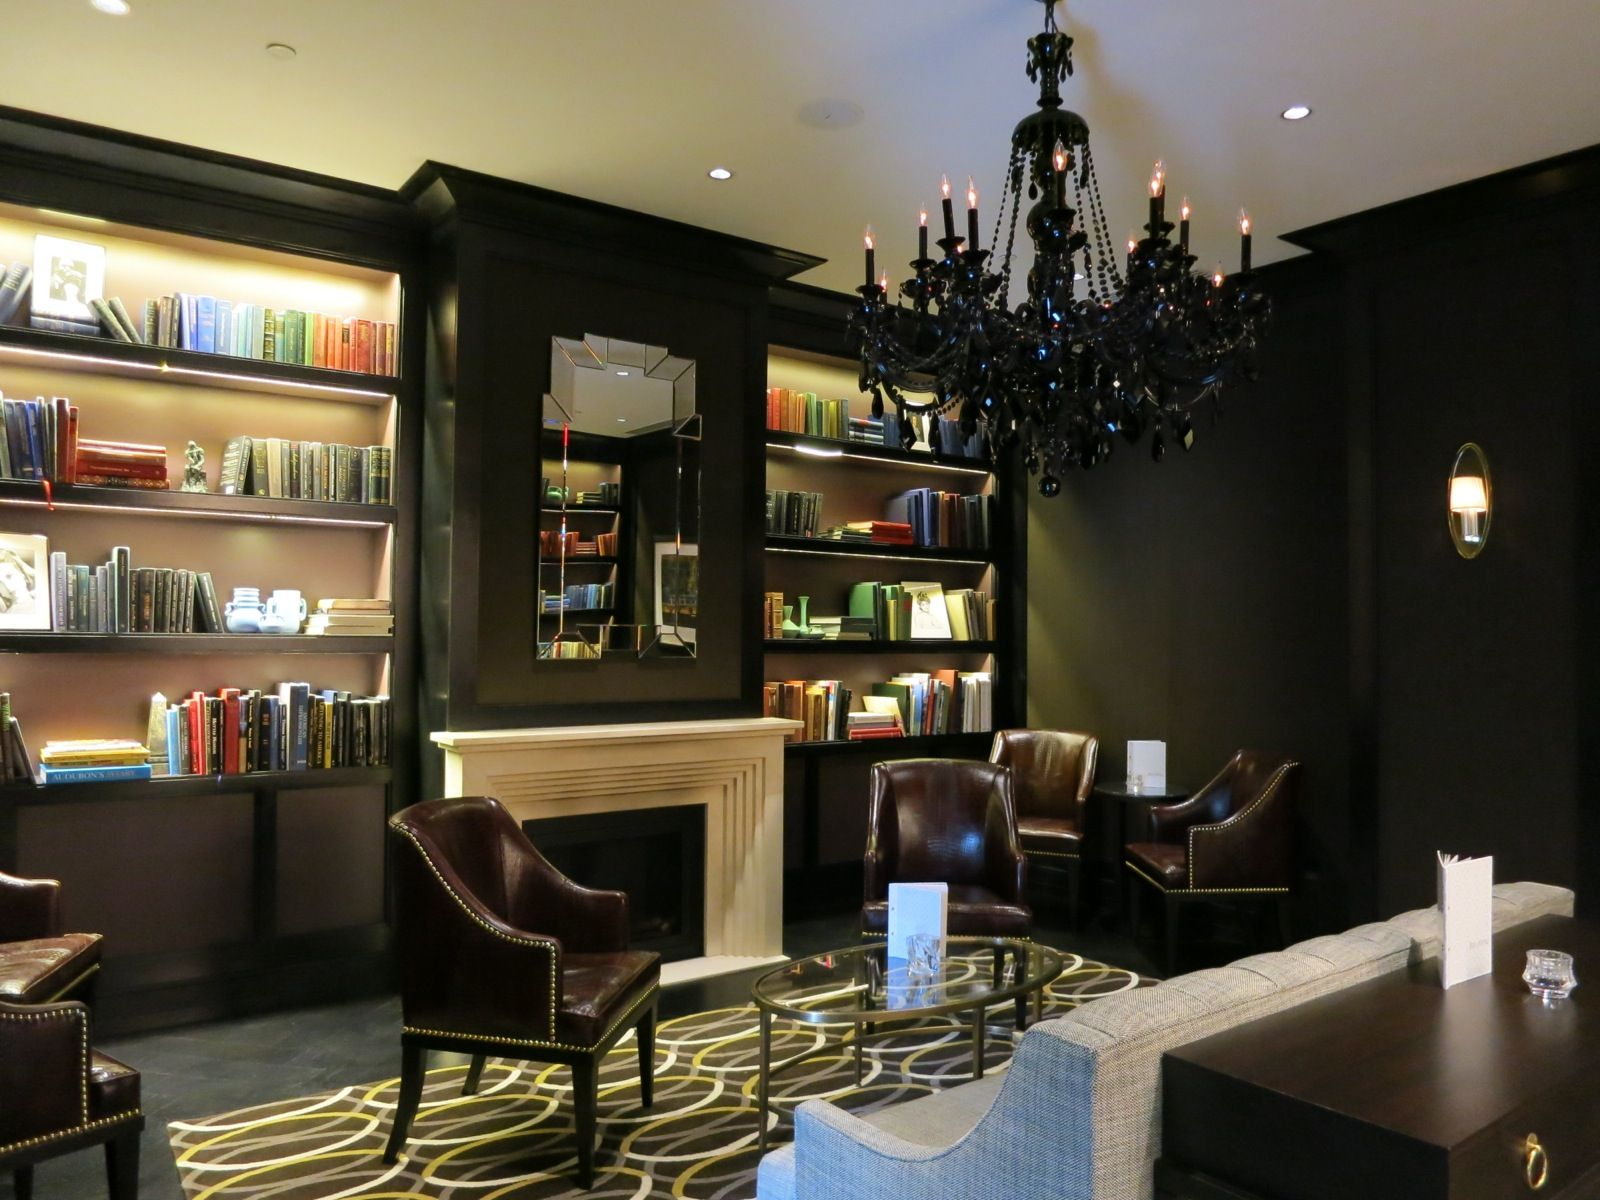 5 Star Luxury Hotels In Philadelphia Shun He Whether You